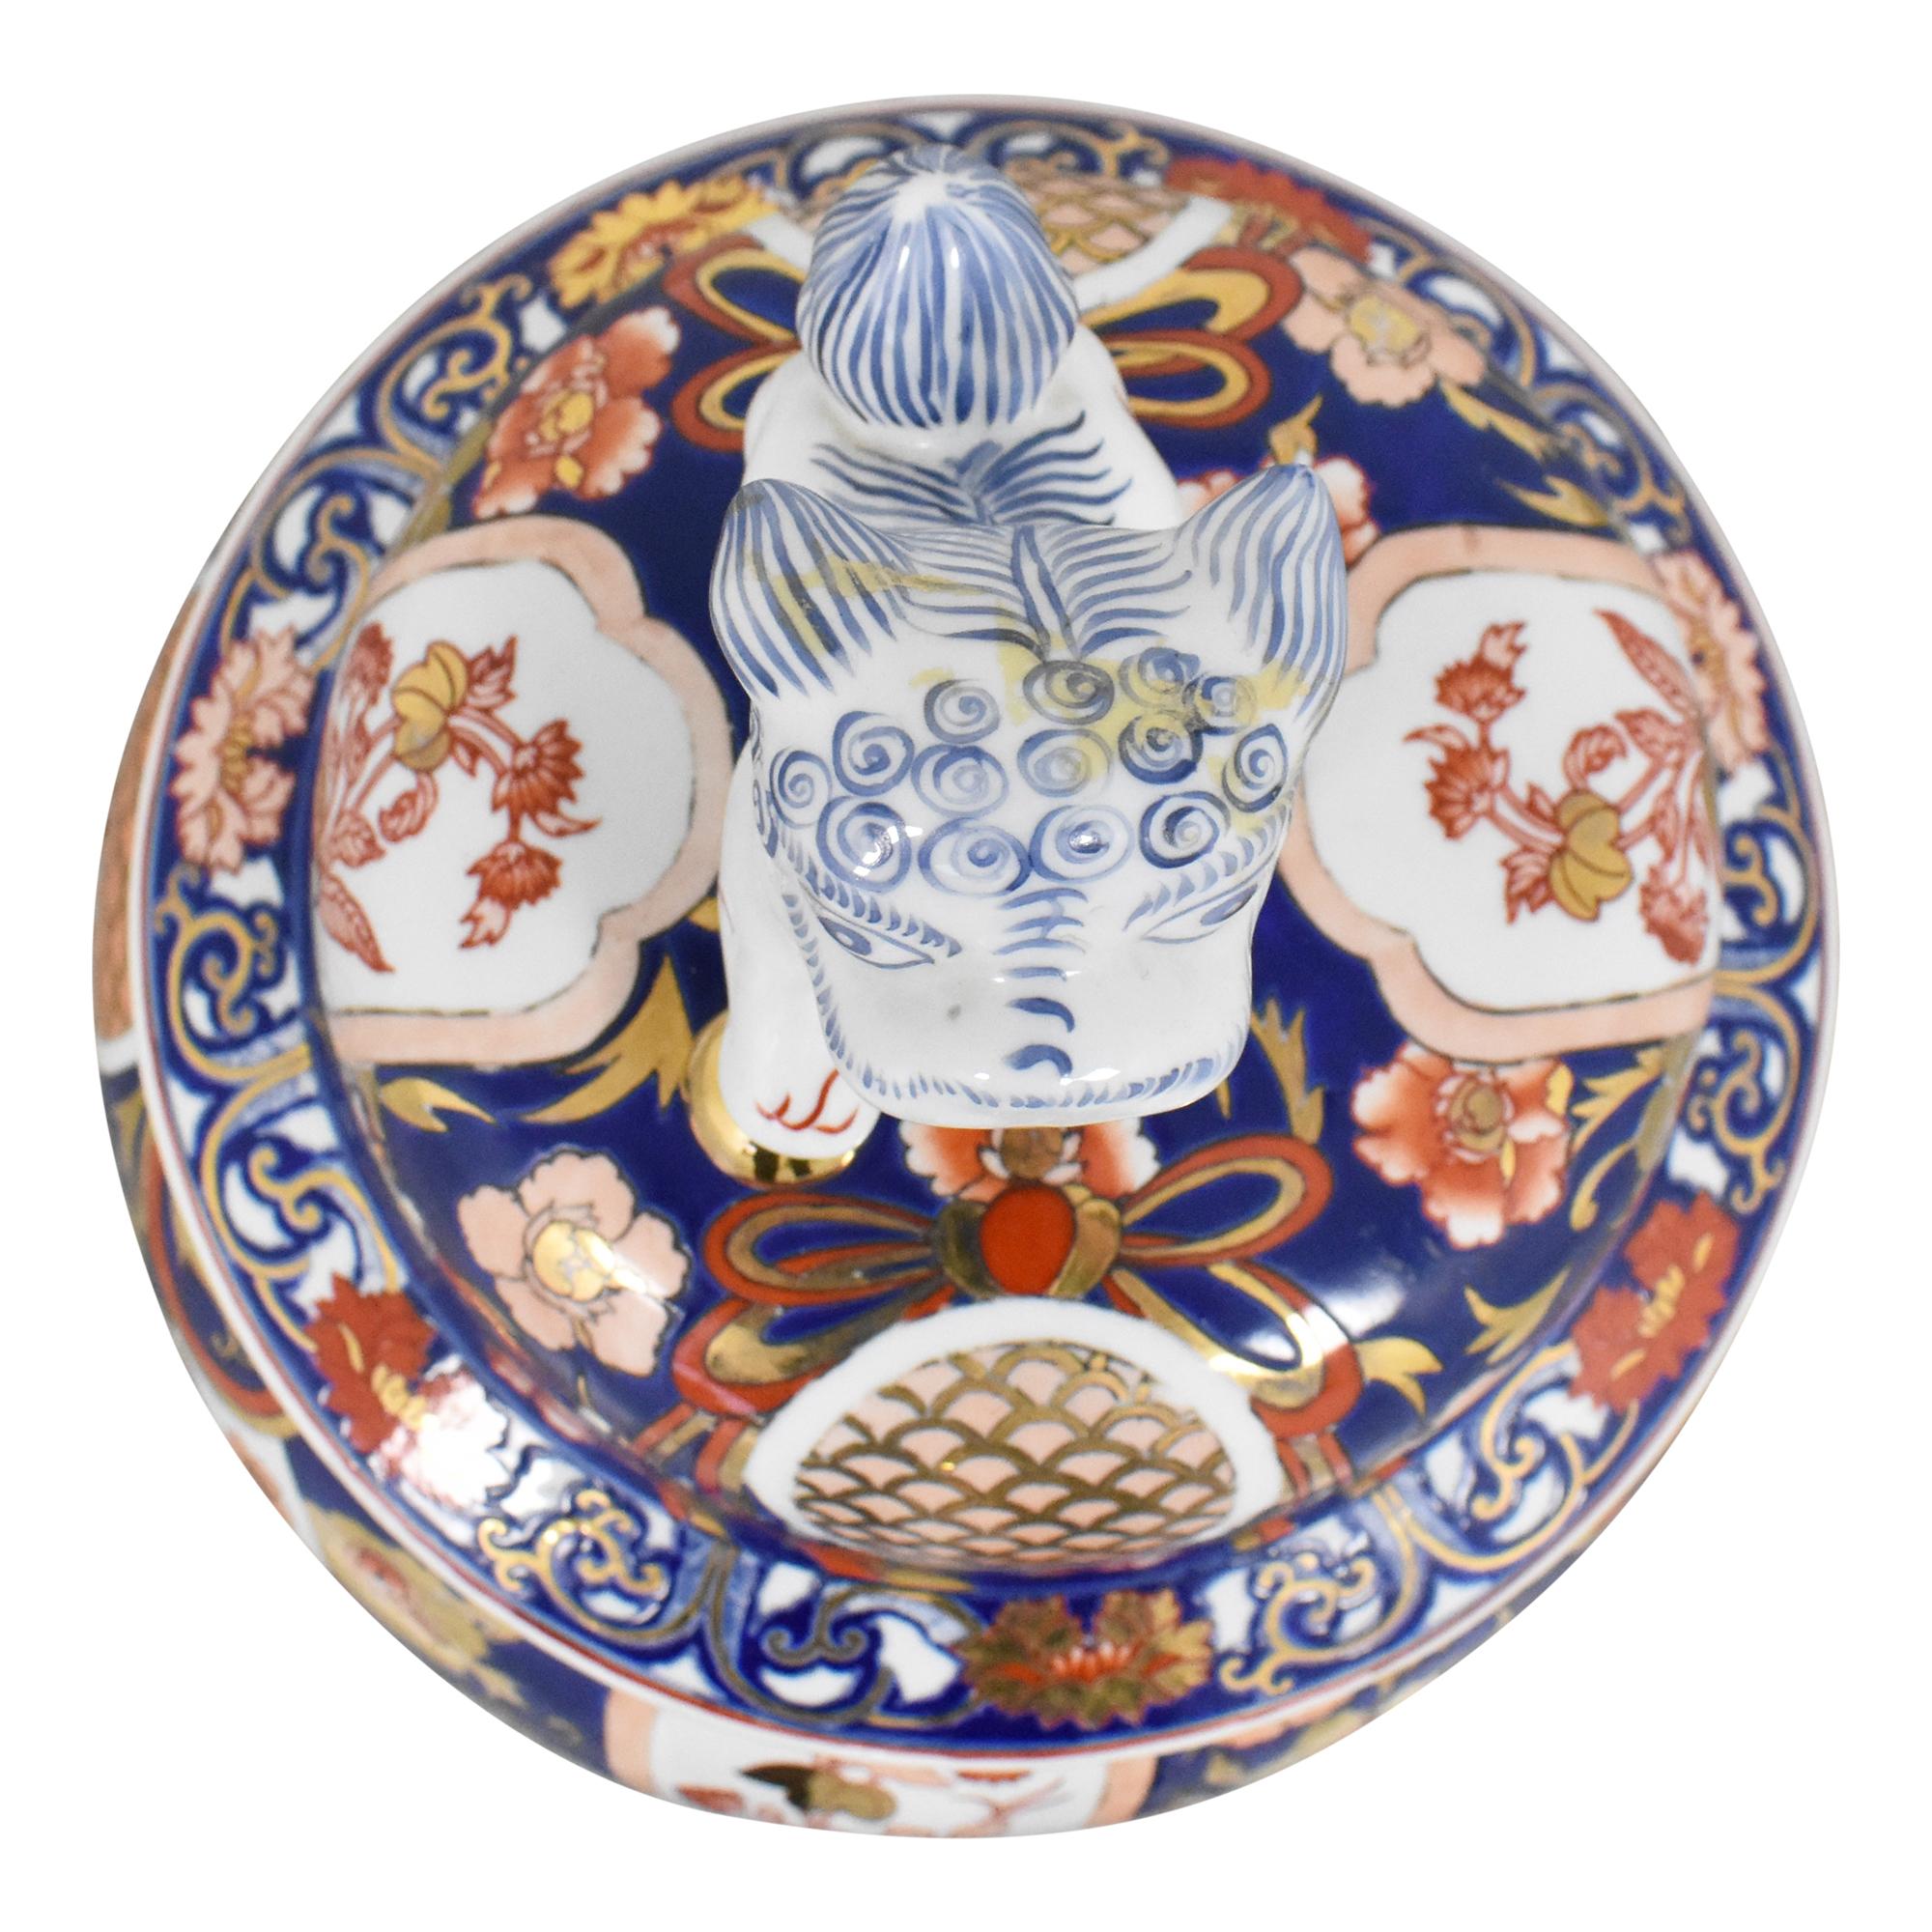 Maitland-Smith Maitland-Smith Decorative Vase pa